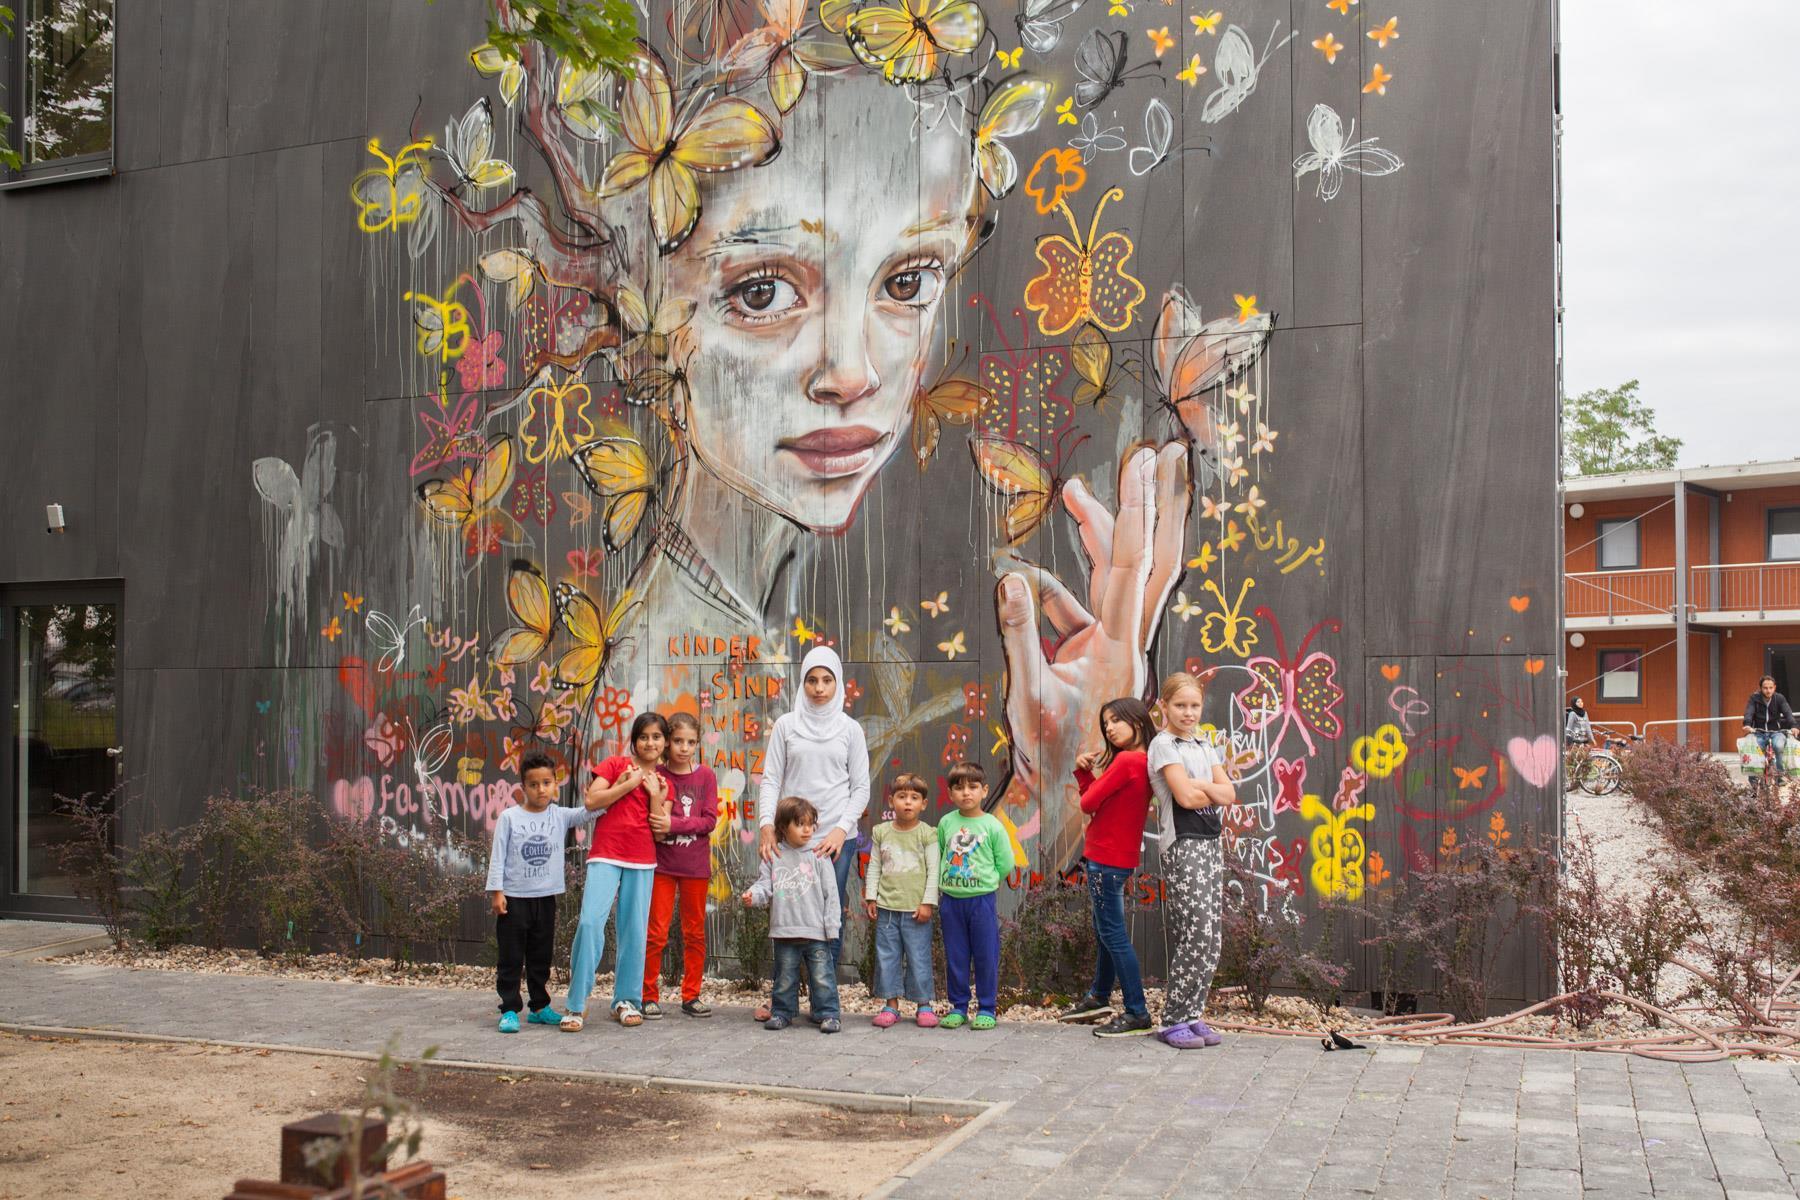 Herakut for a Street Art workshop in Refugee Asylum in Potsdam, Germany.